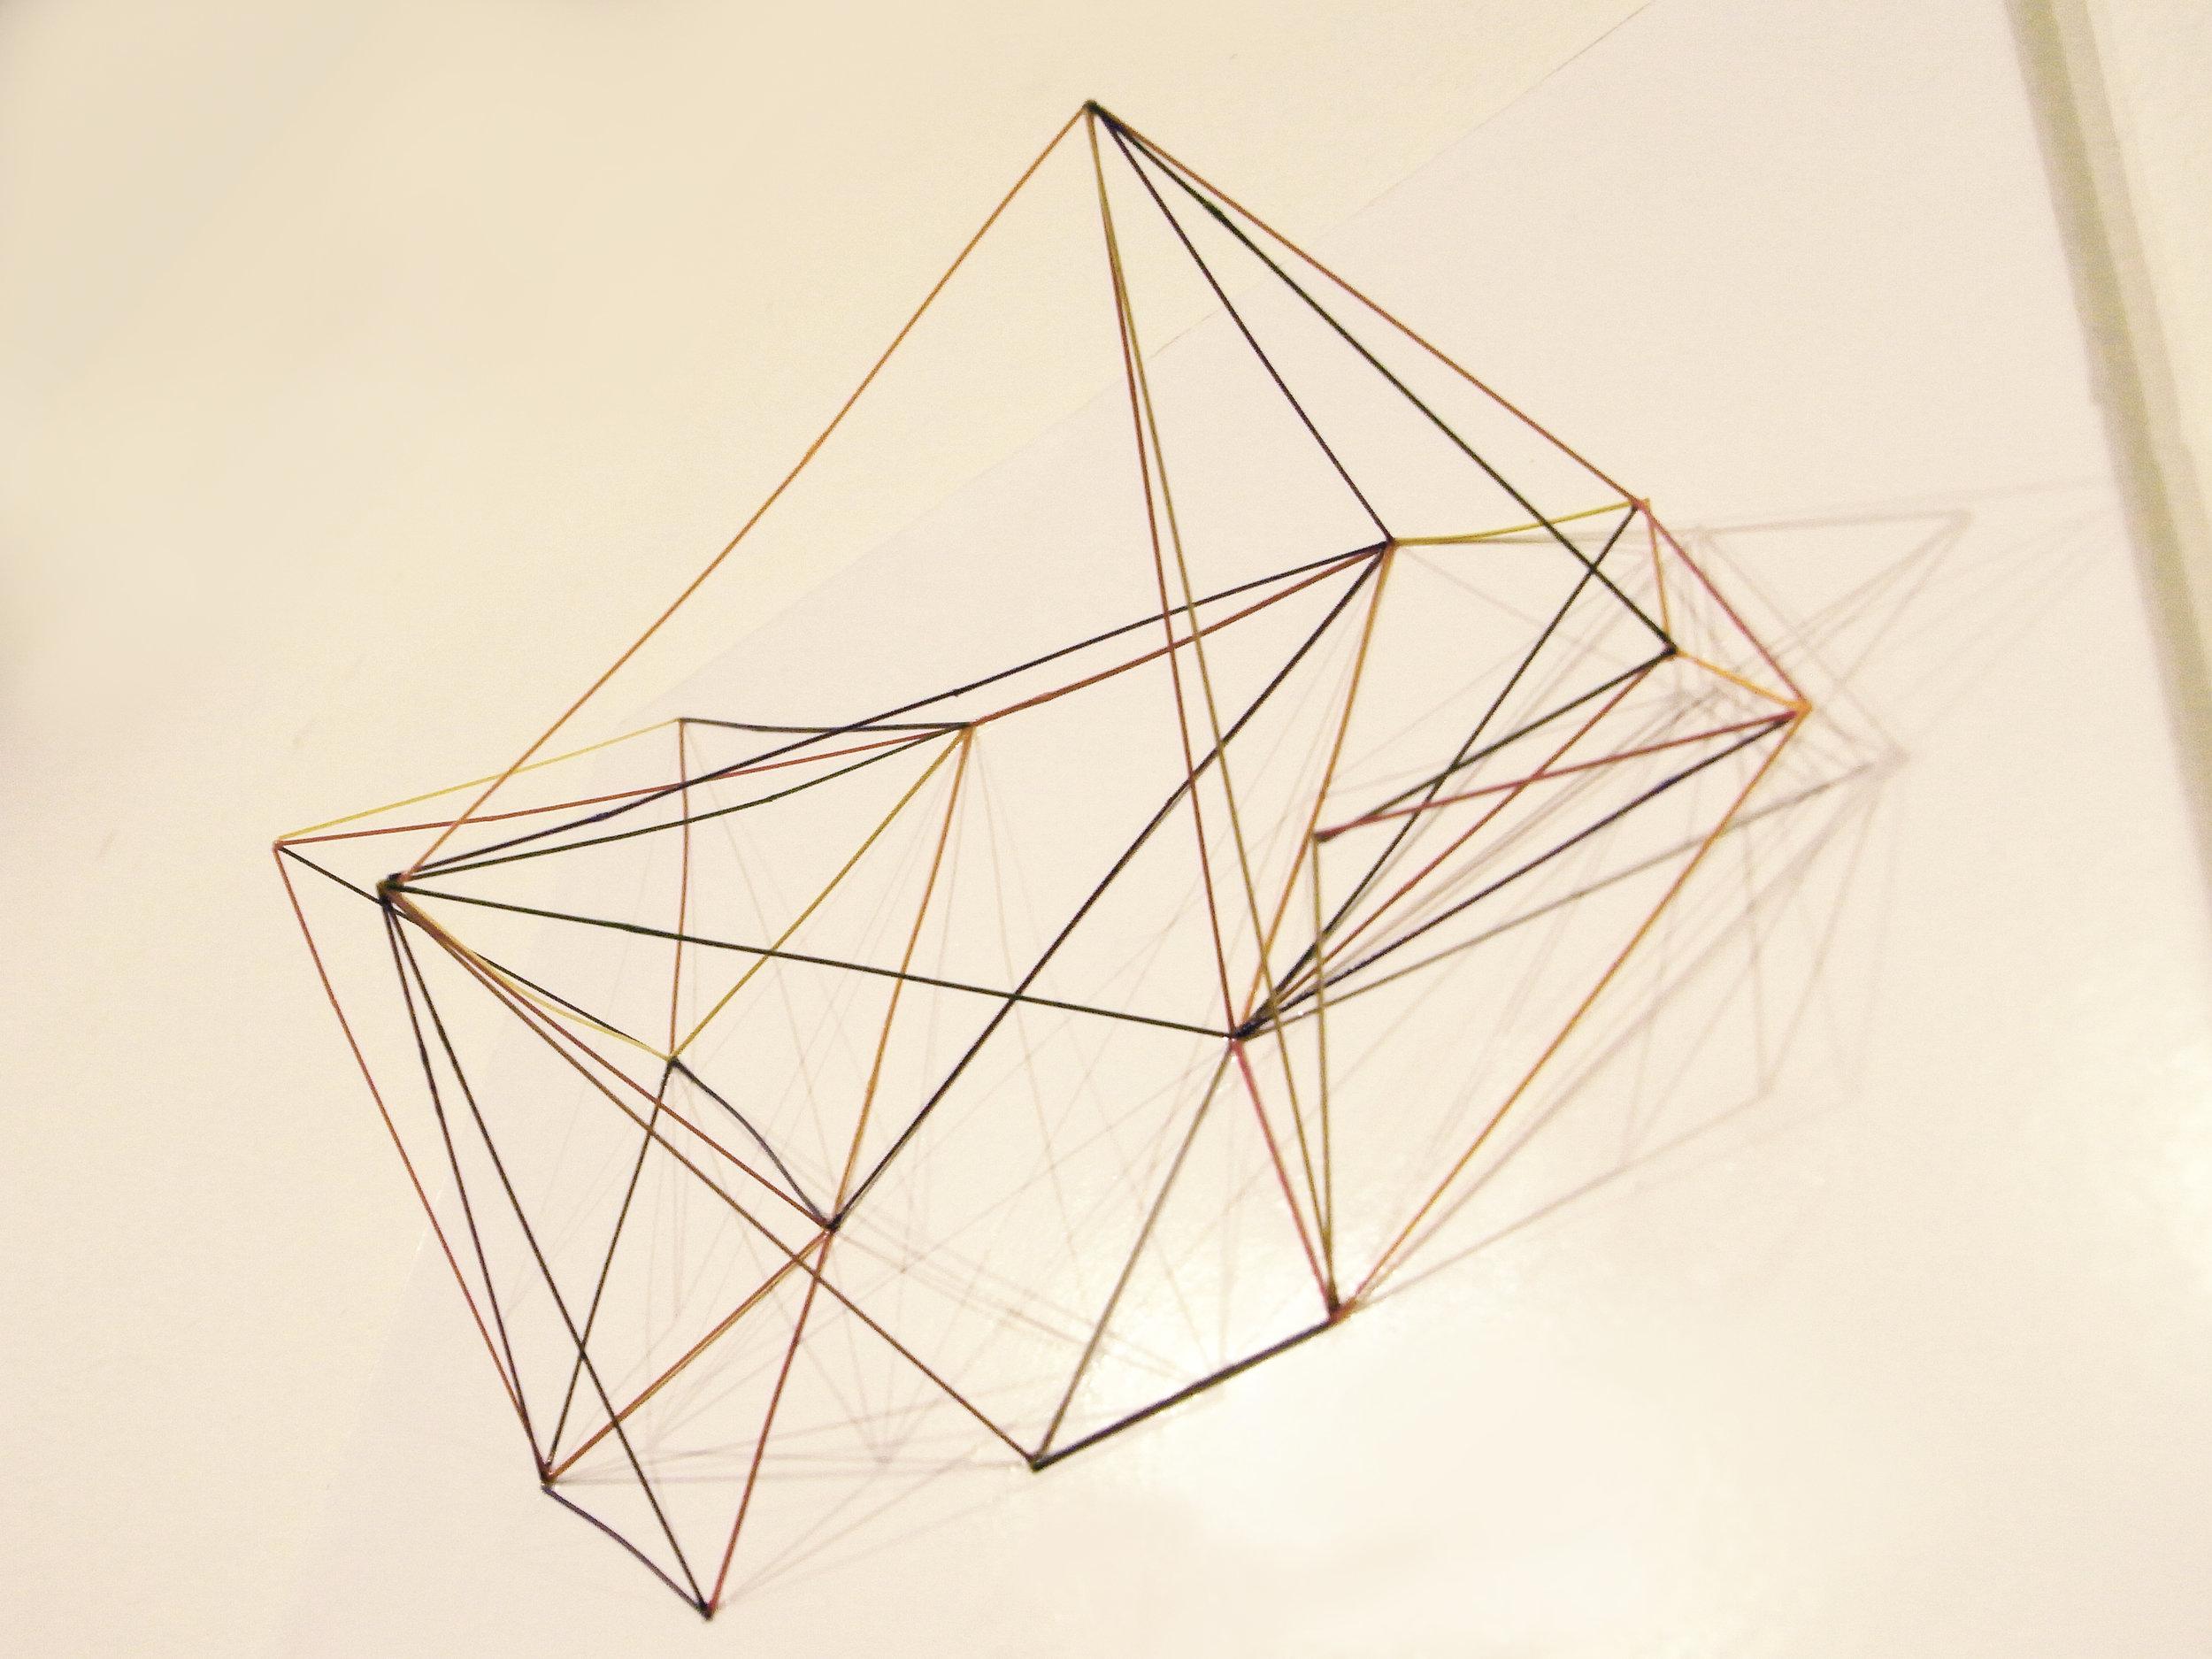 Space Sketch 2 (Detail) / 2011 / Mechanical pencil lead refill, Graph paper / 54x78x15 cm